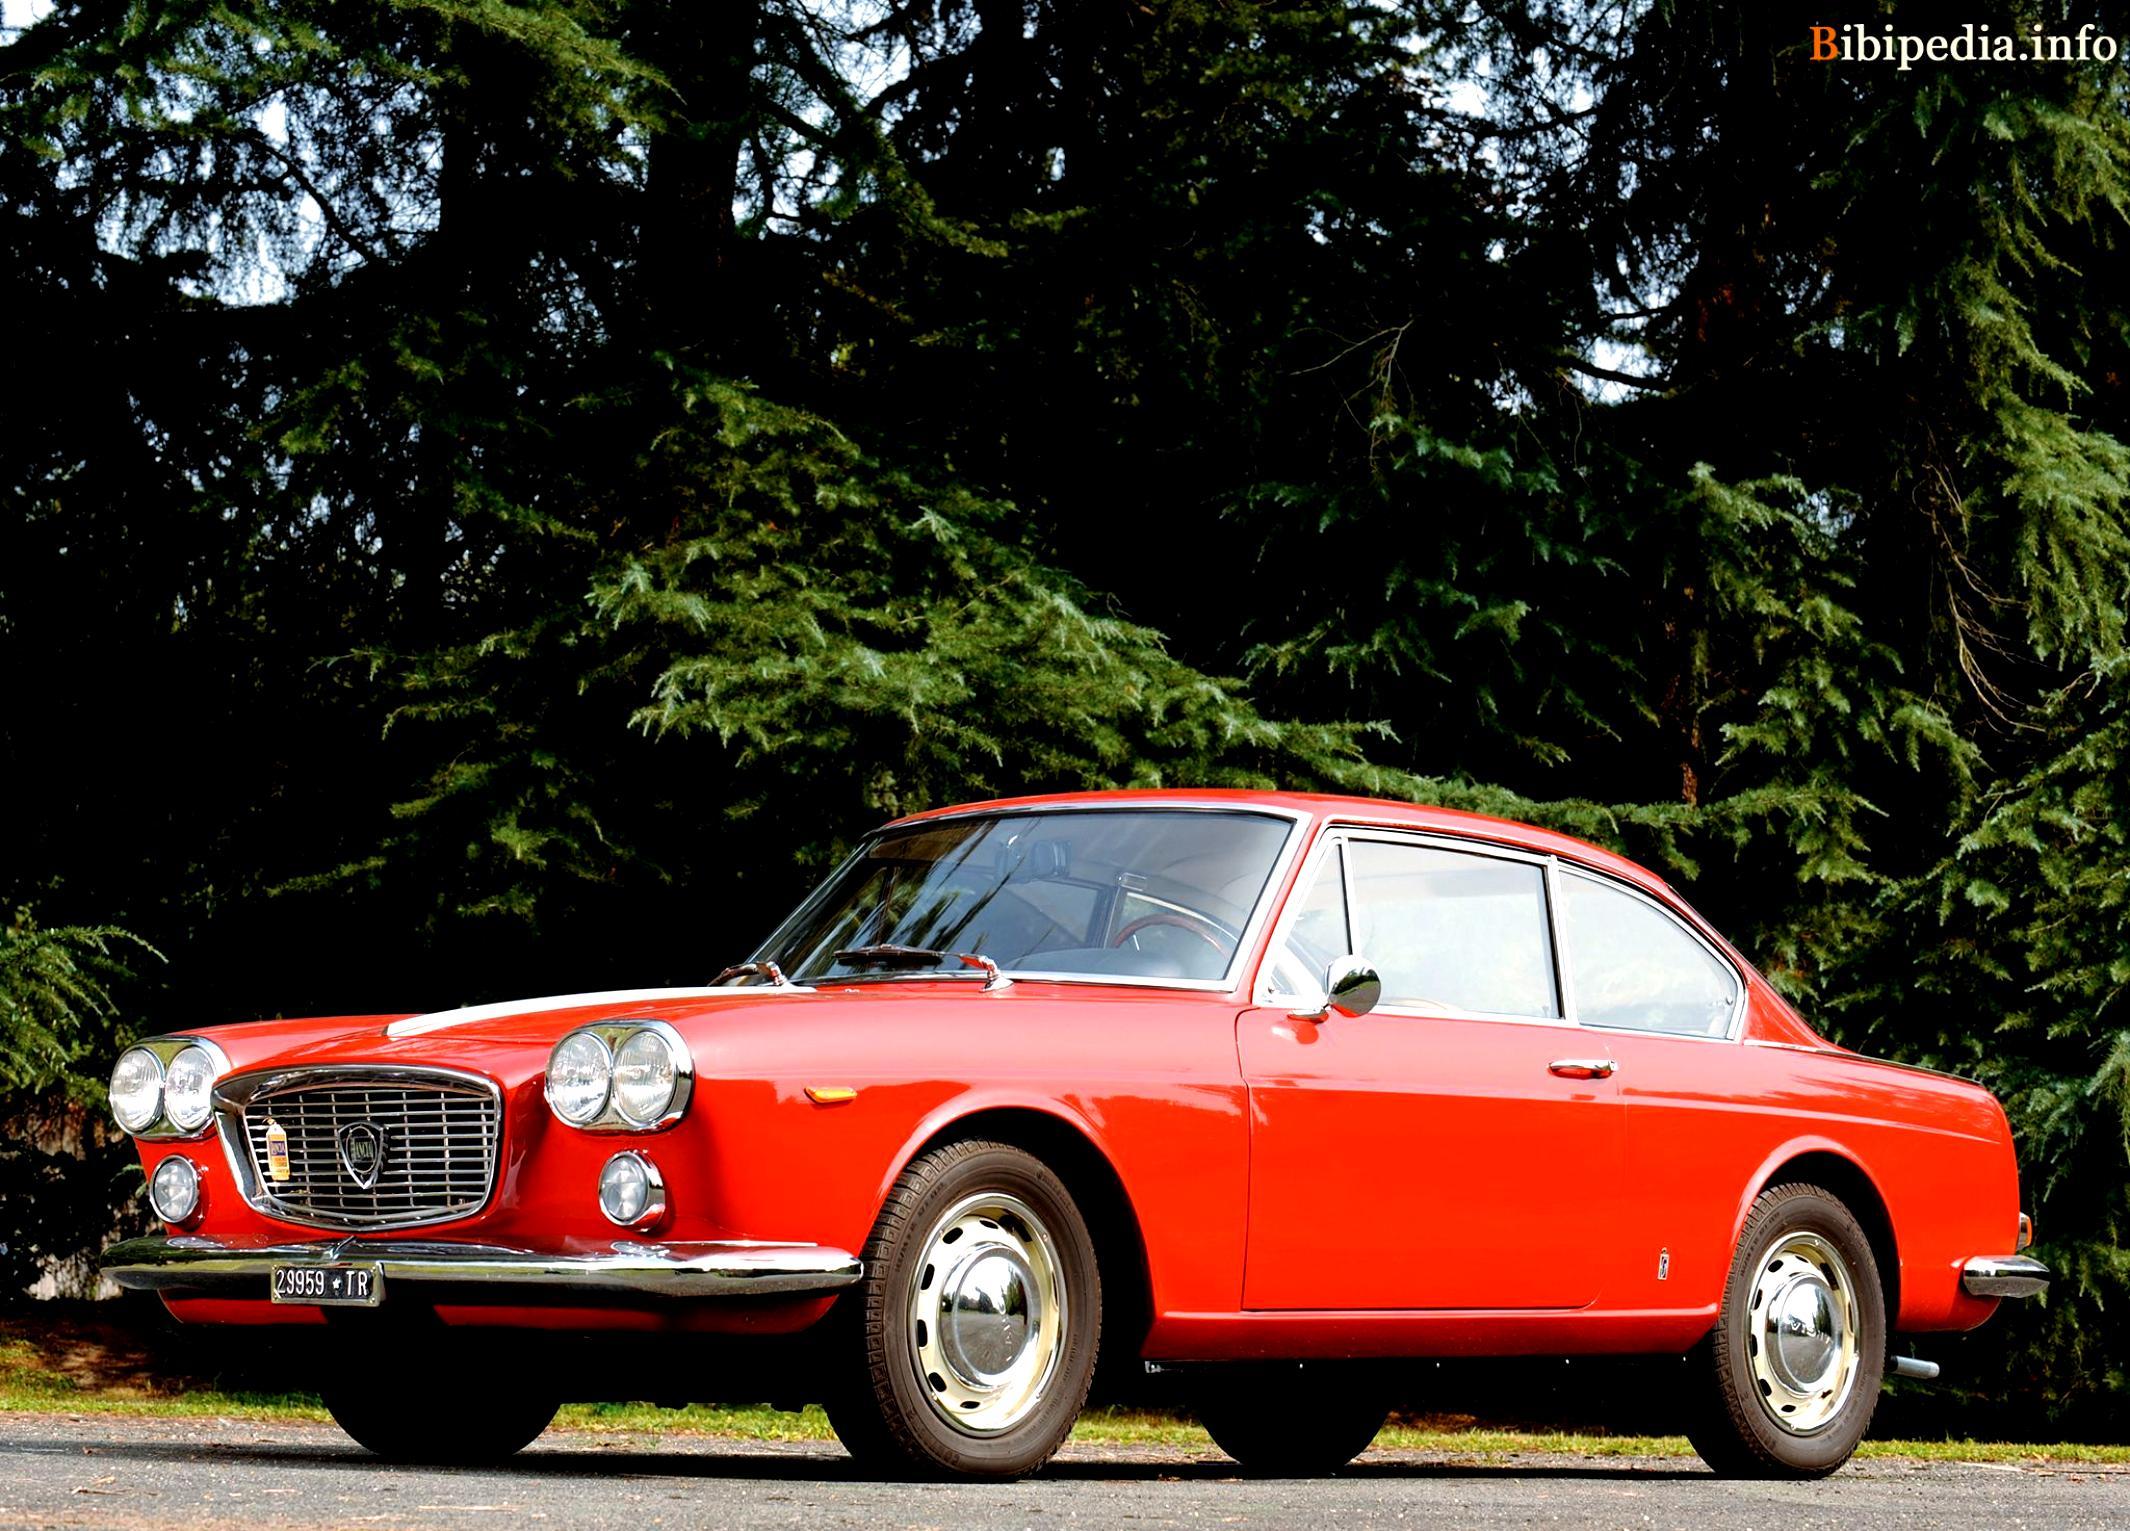 https://motoimg.com/images/lancia-flavia-convertible-1960-06.jpg